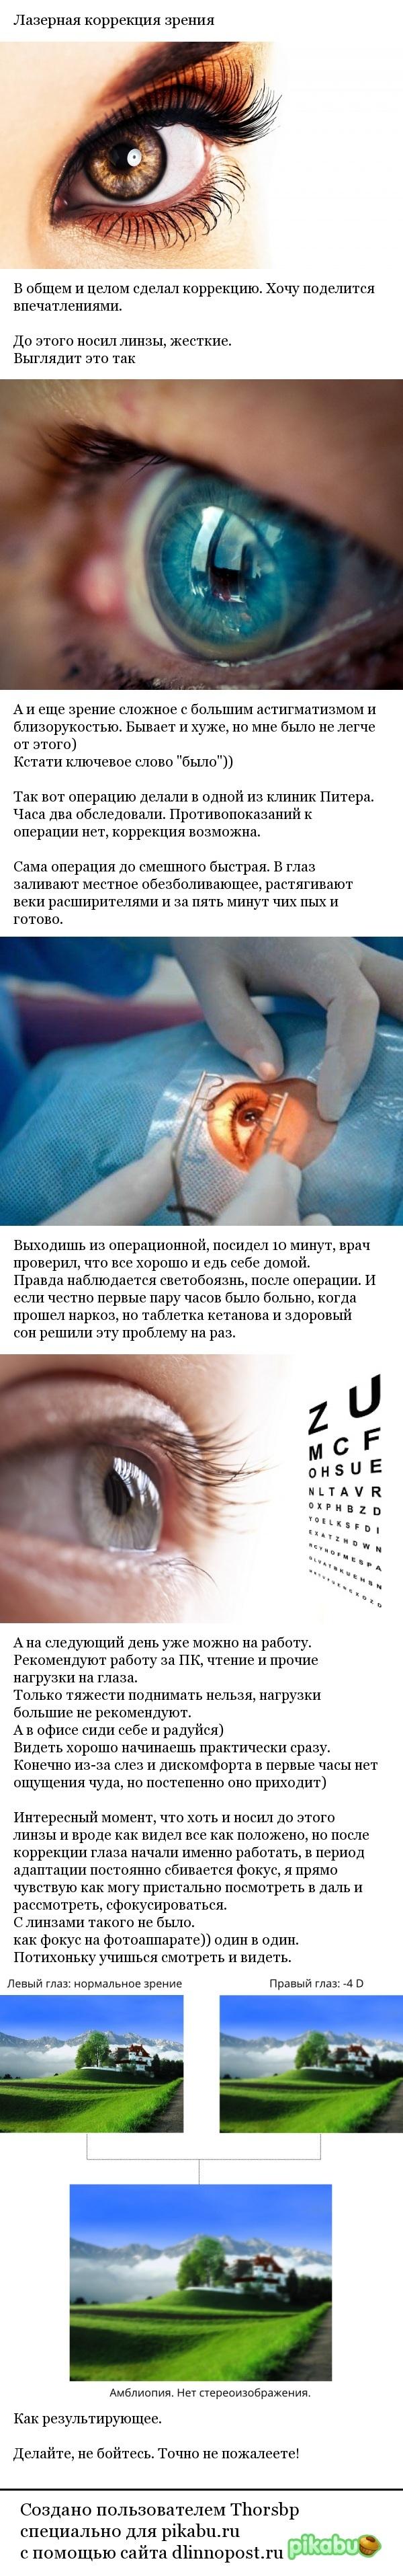 Лазерная коррекция Зрение, Коррекция, Лазер, Длиннопост